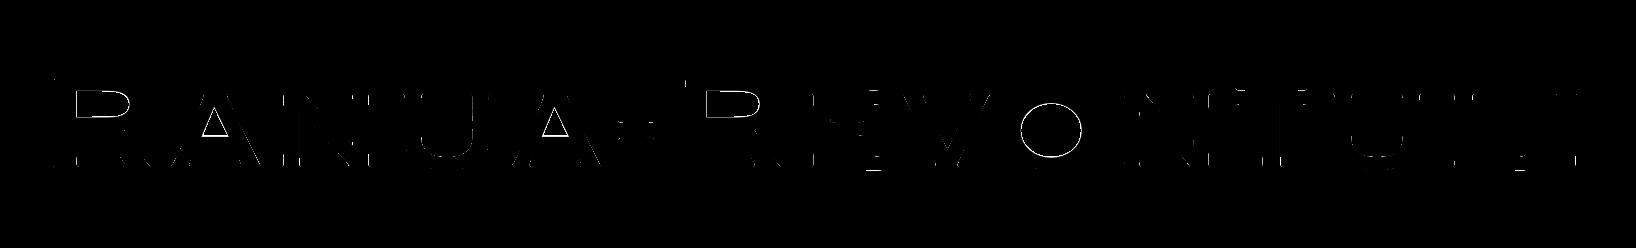 Ranua-Revontuli